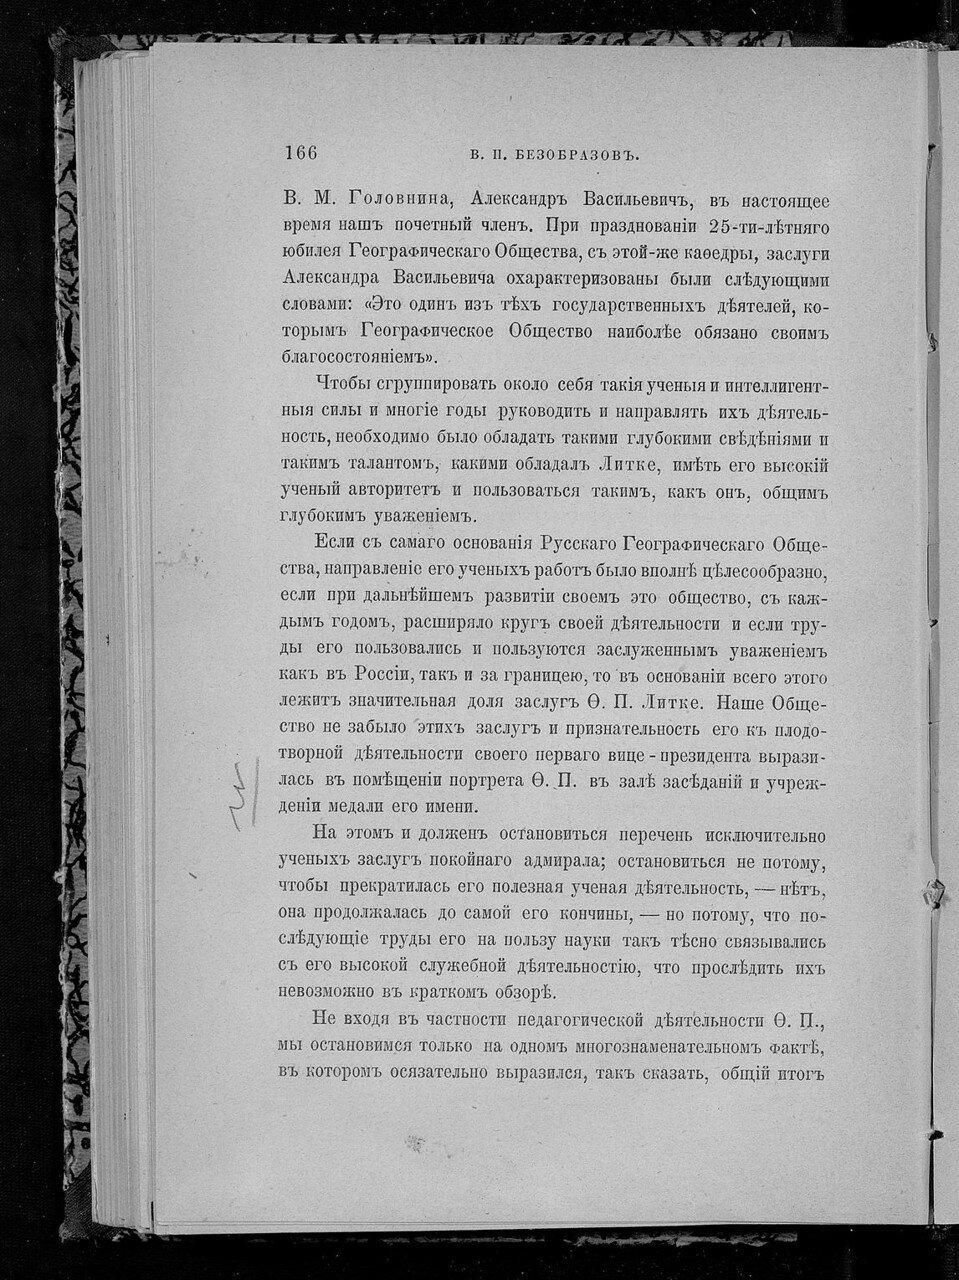 https://img-fotki.yandex.ru/get/879536/199368979.d6/0_21de44_f72fb11_XXXL.jpg